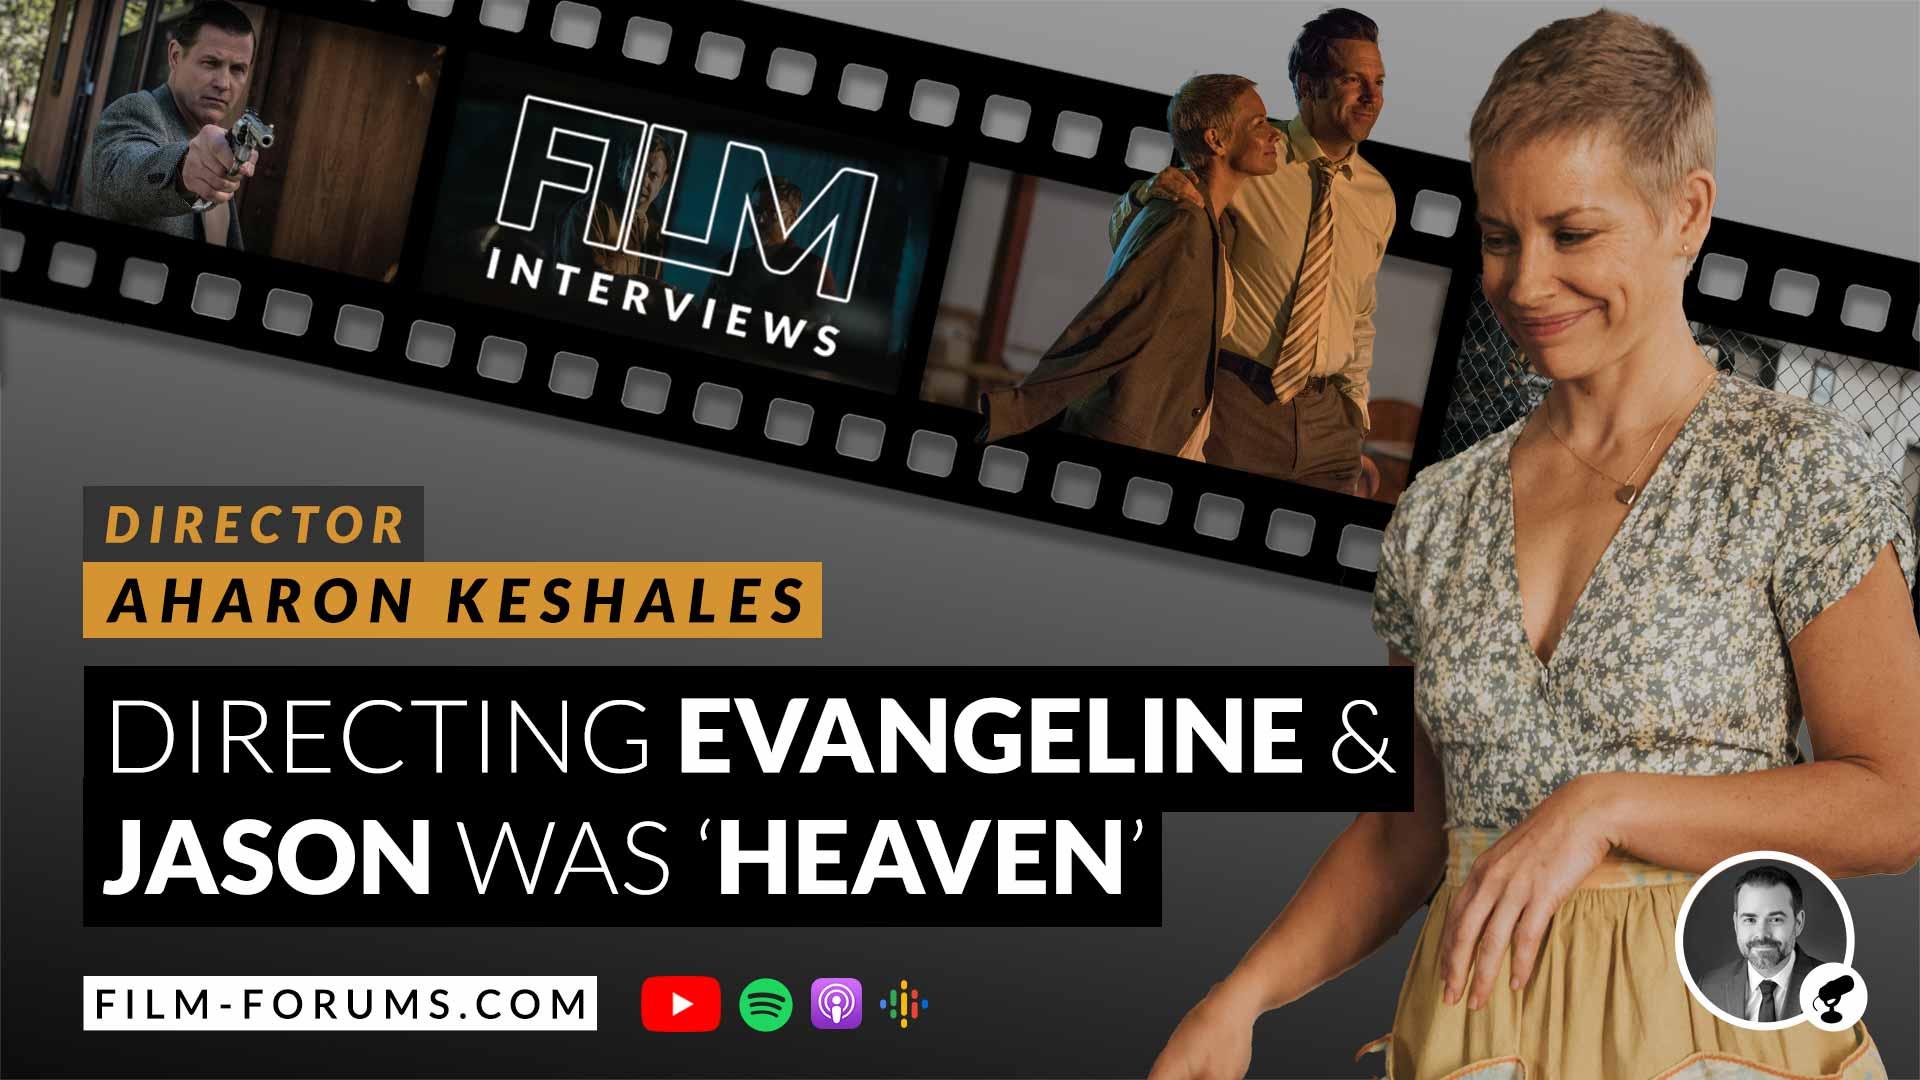 Aharon Keshales South of Heaven (2021)